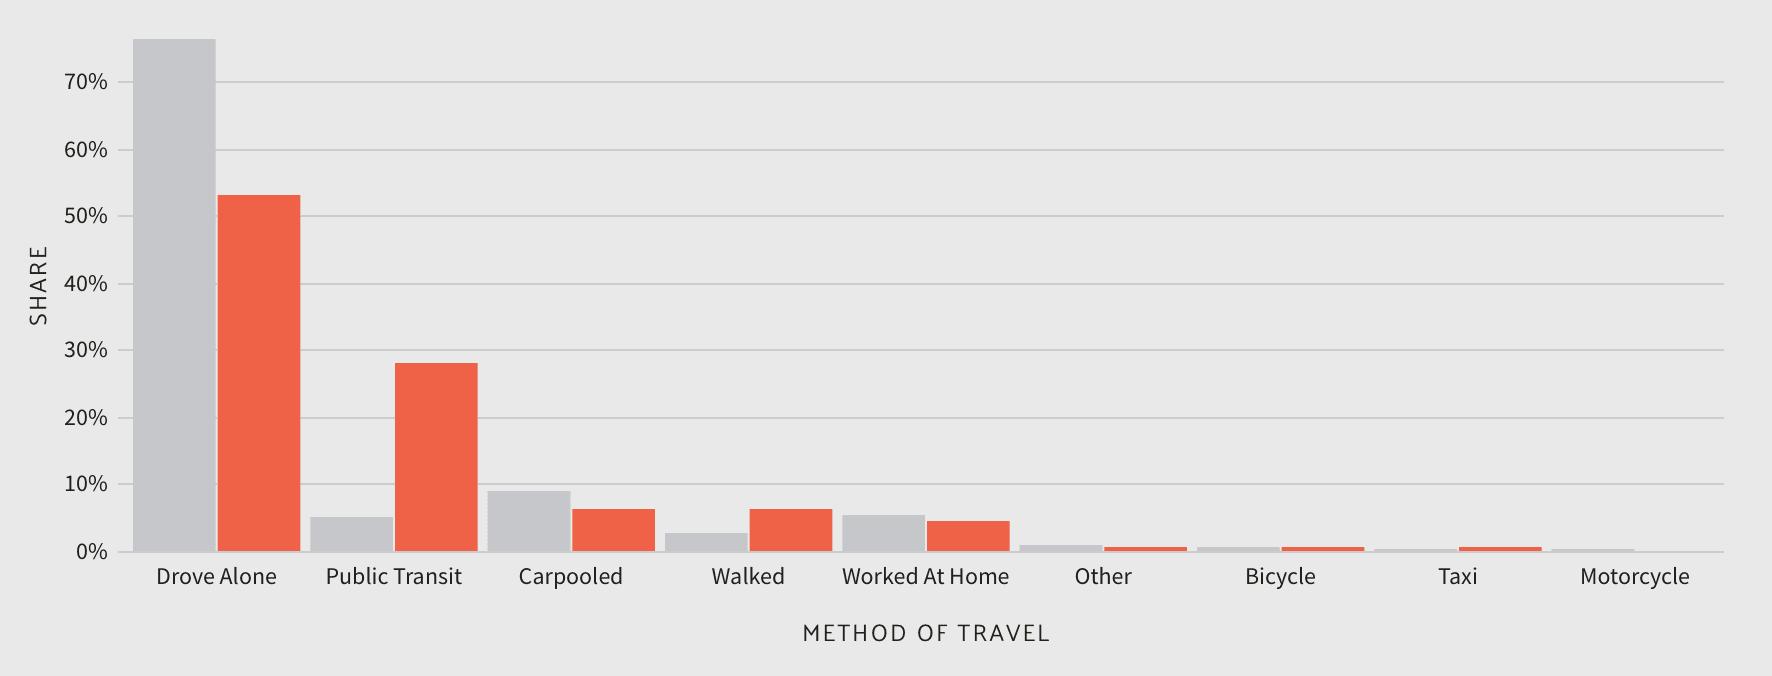 Commuter Transportation in New York